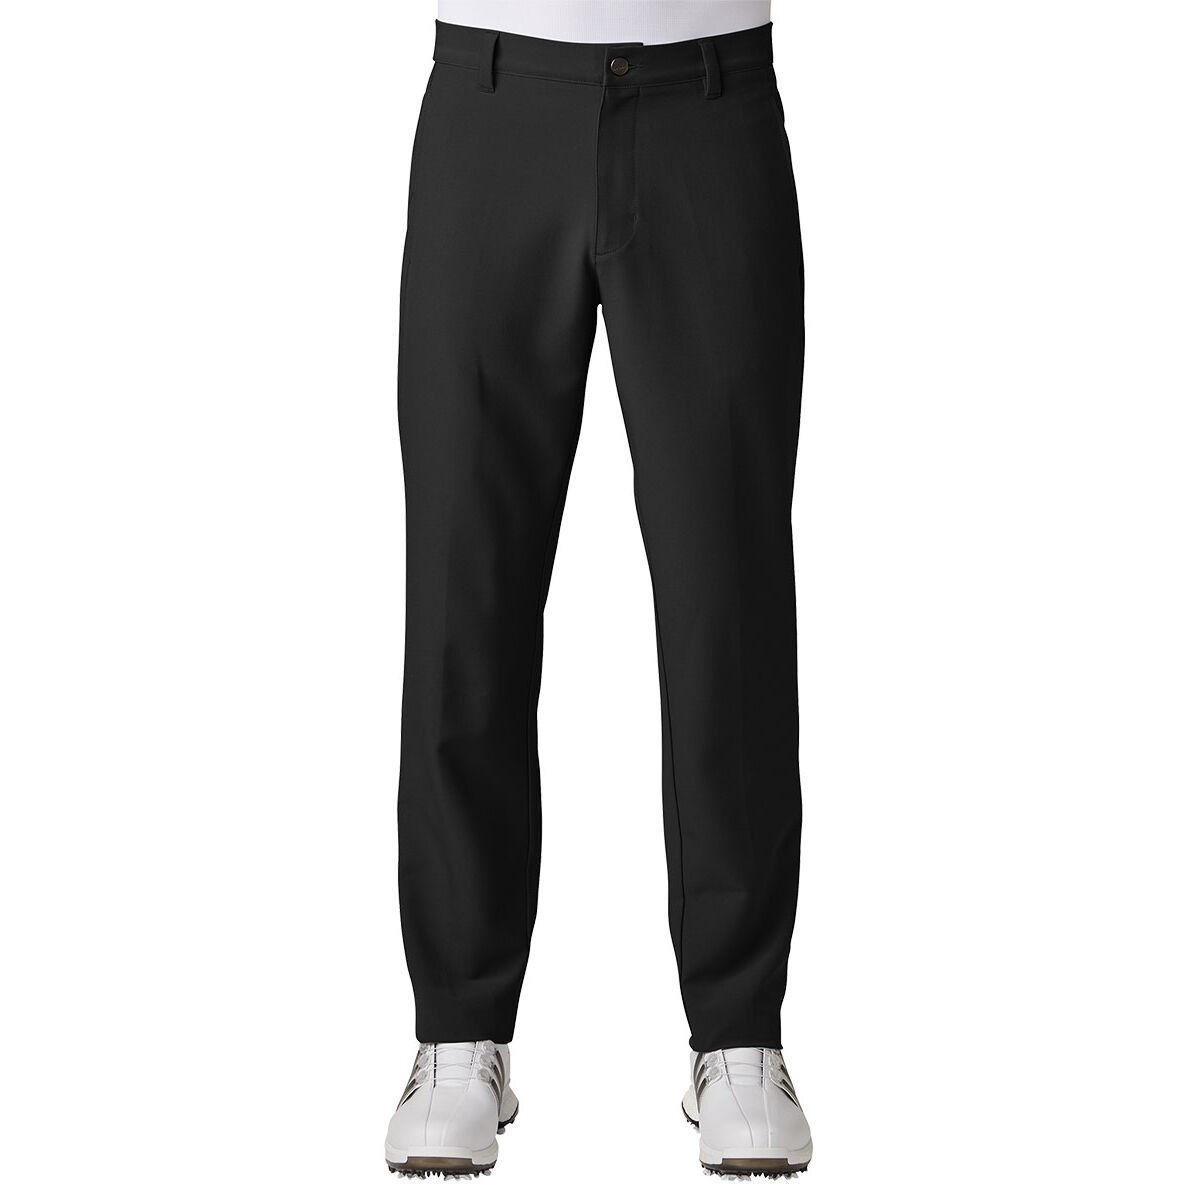 pantalon adidas golf